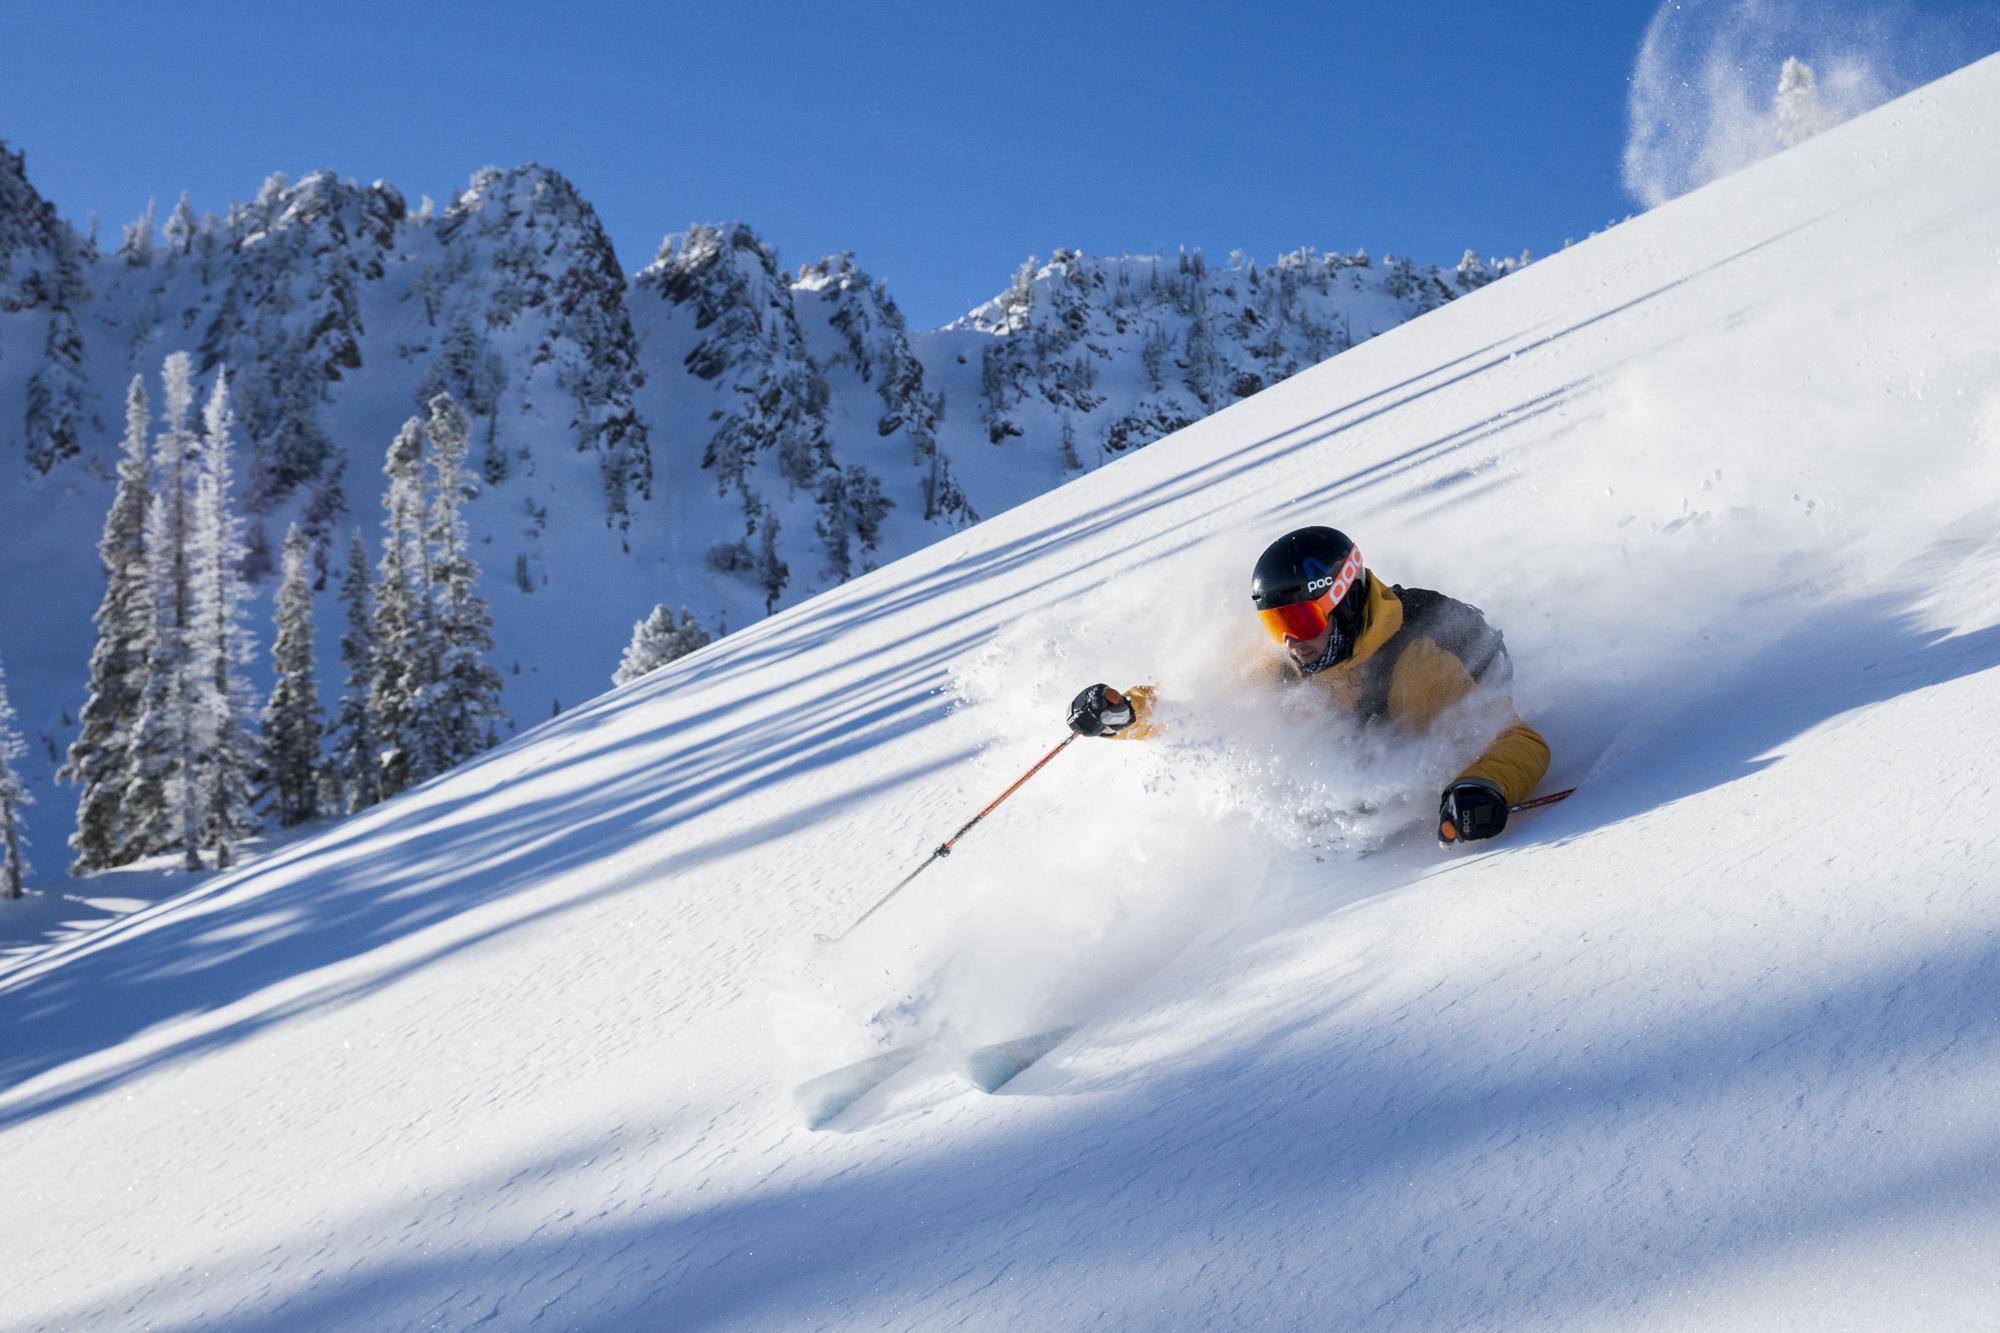 Snowbasin_Powder_Photographer_CamMcleod_1549470021932.jpg